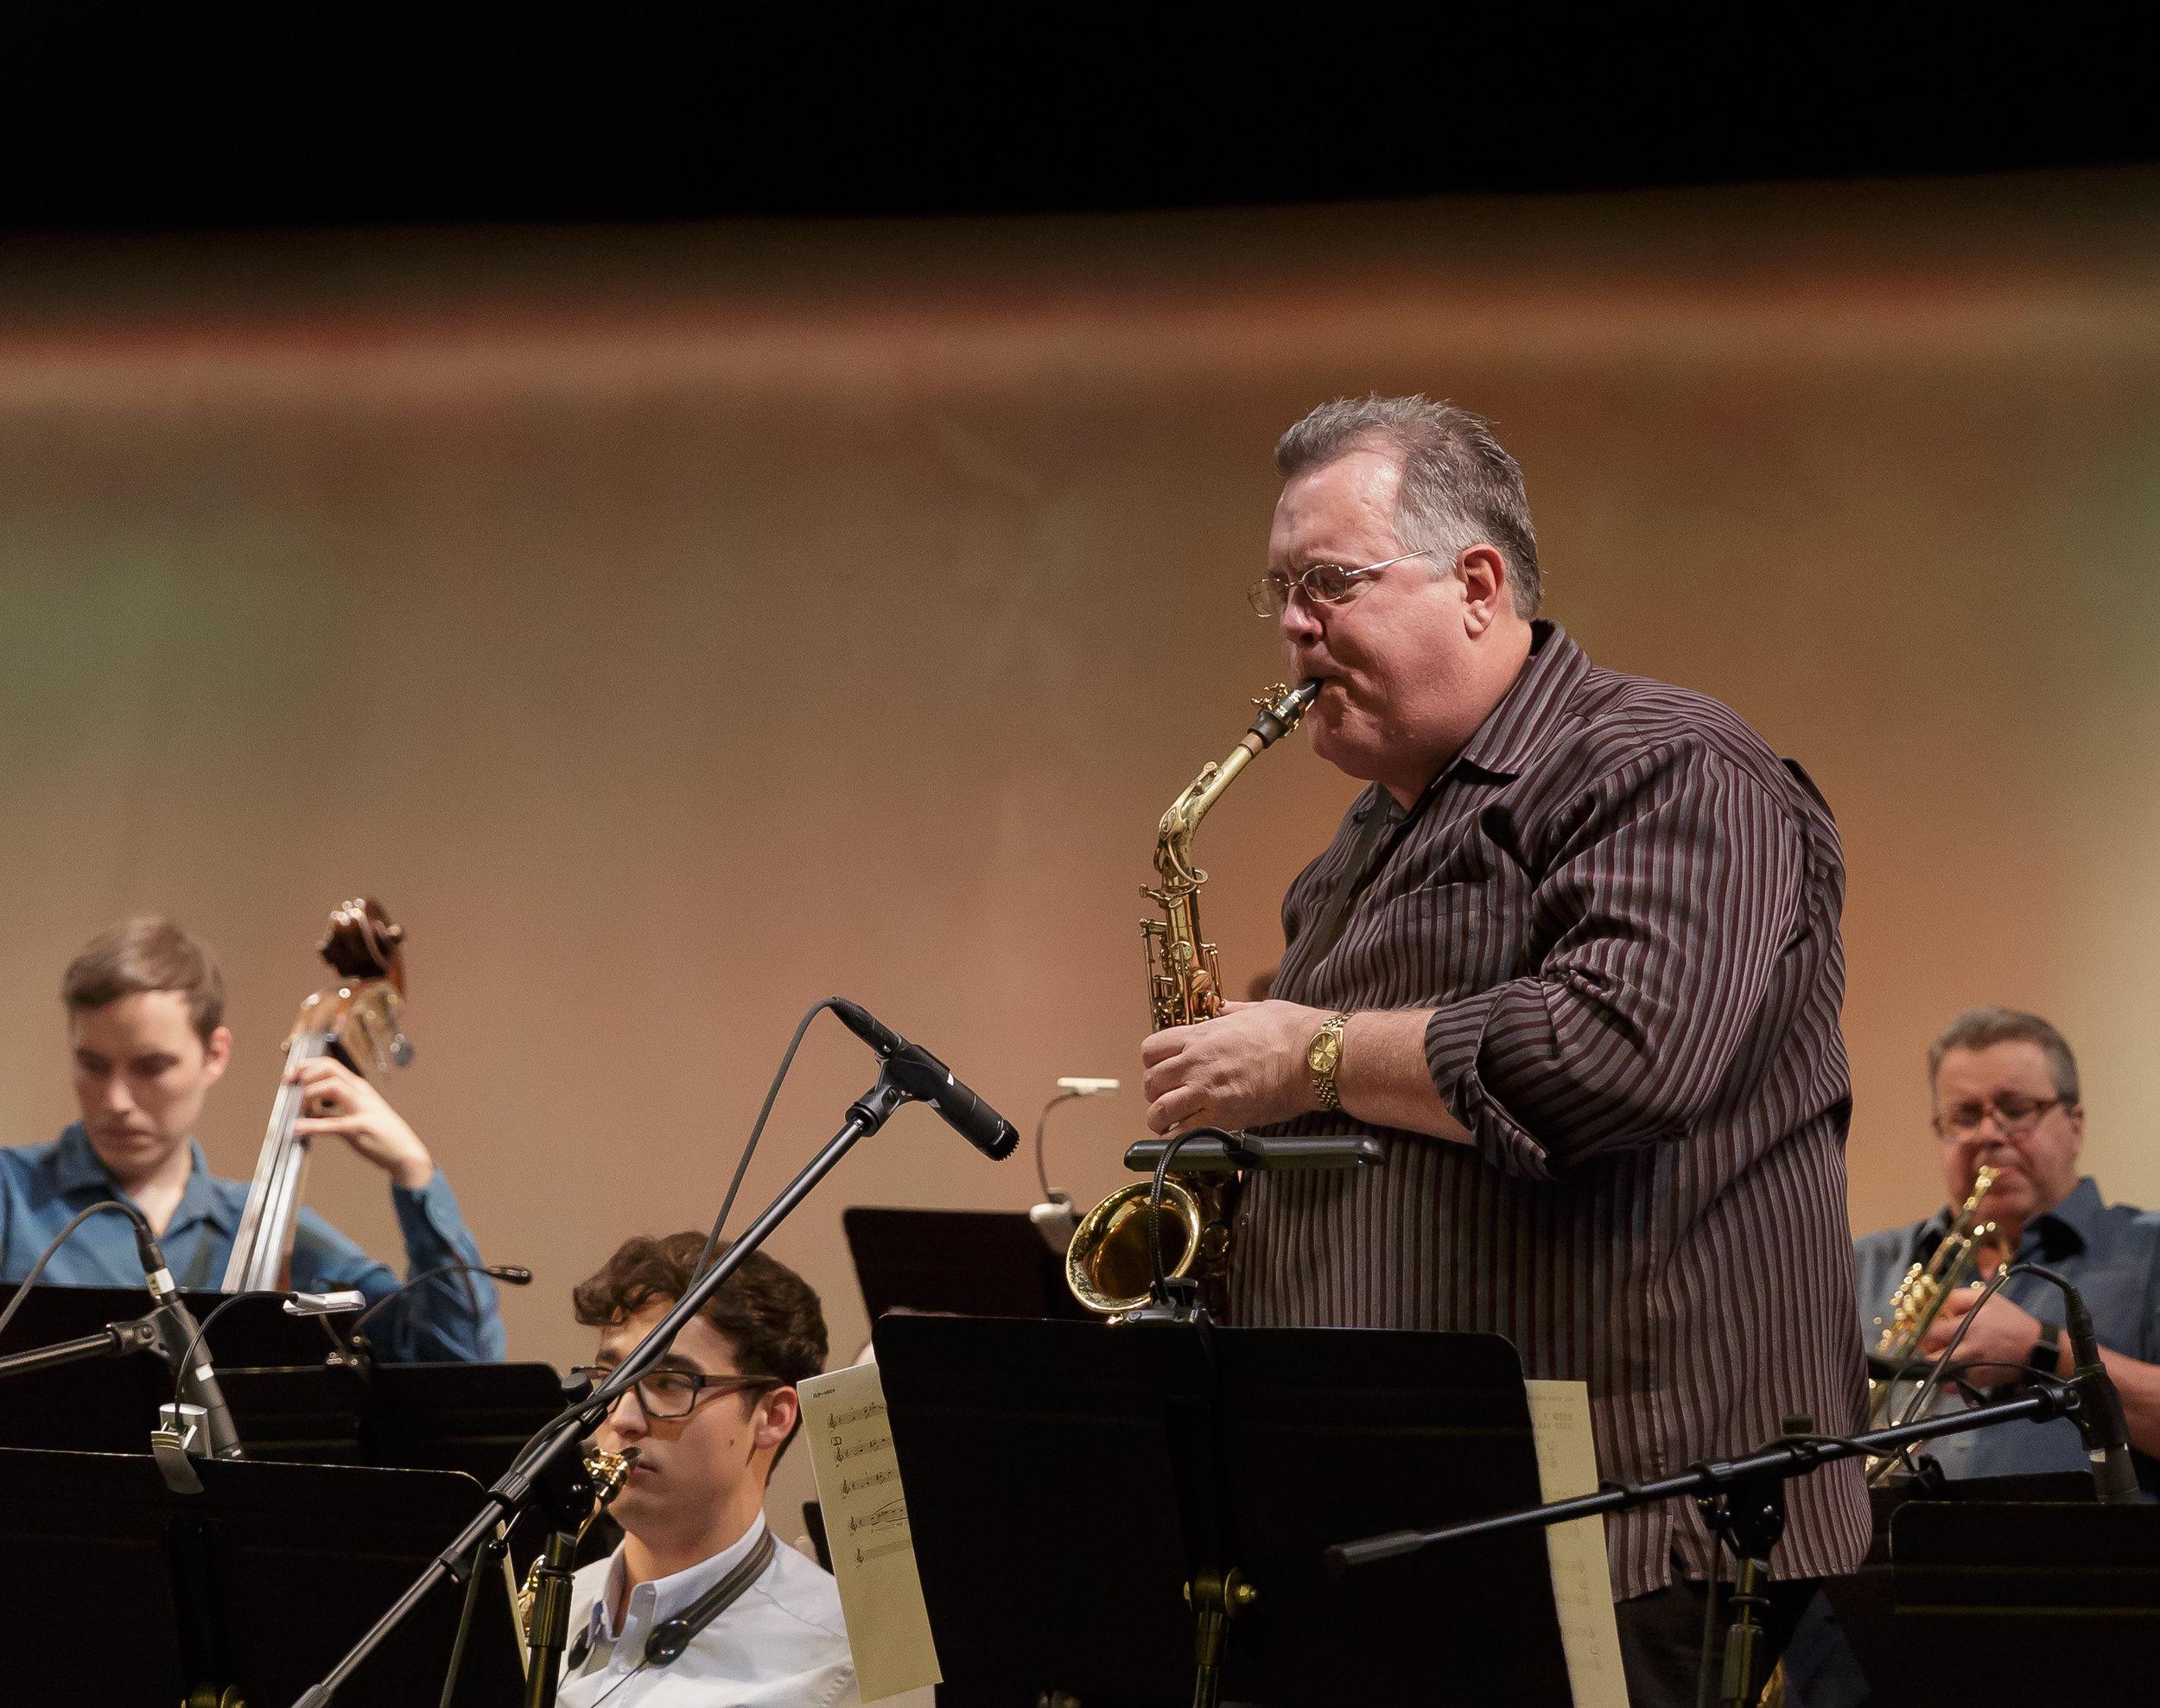 Jim Honeyman, alto sax